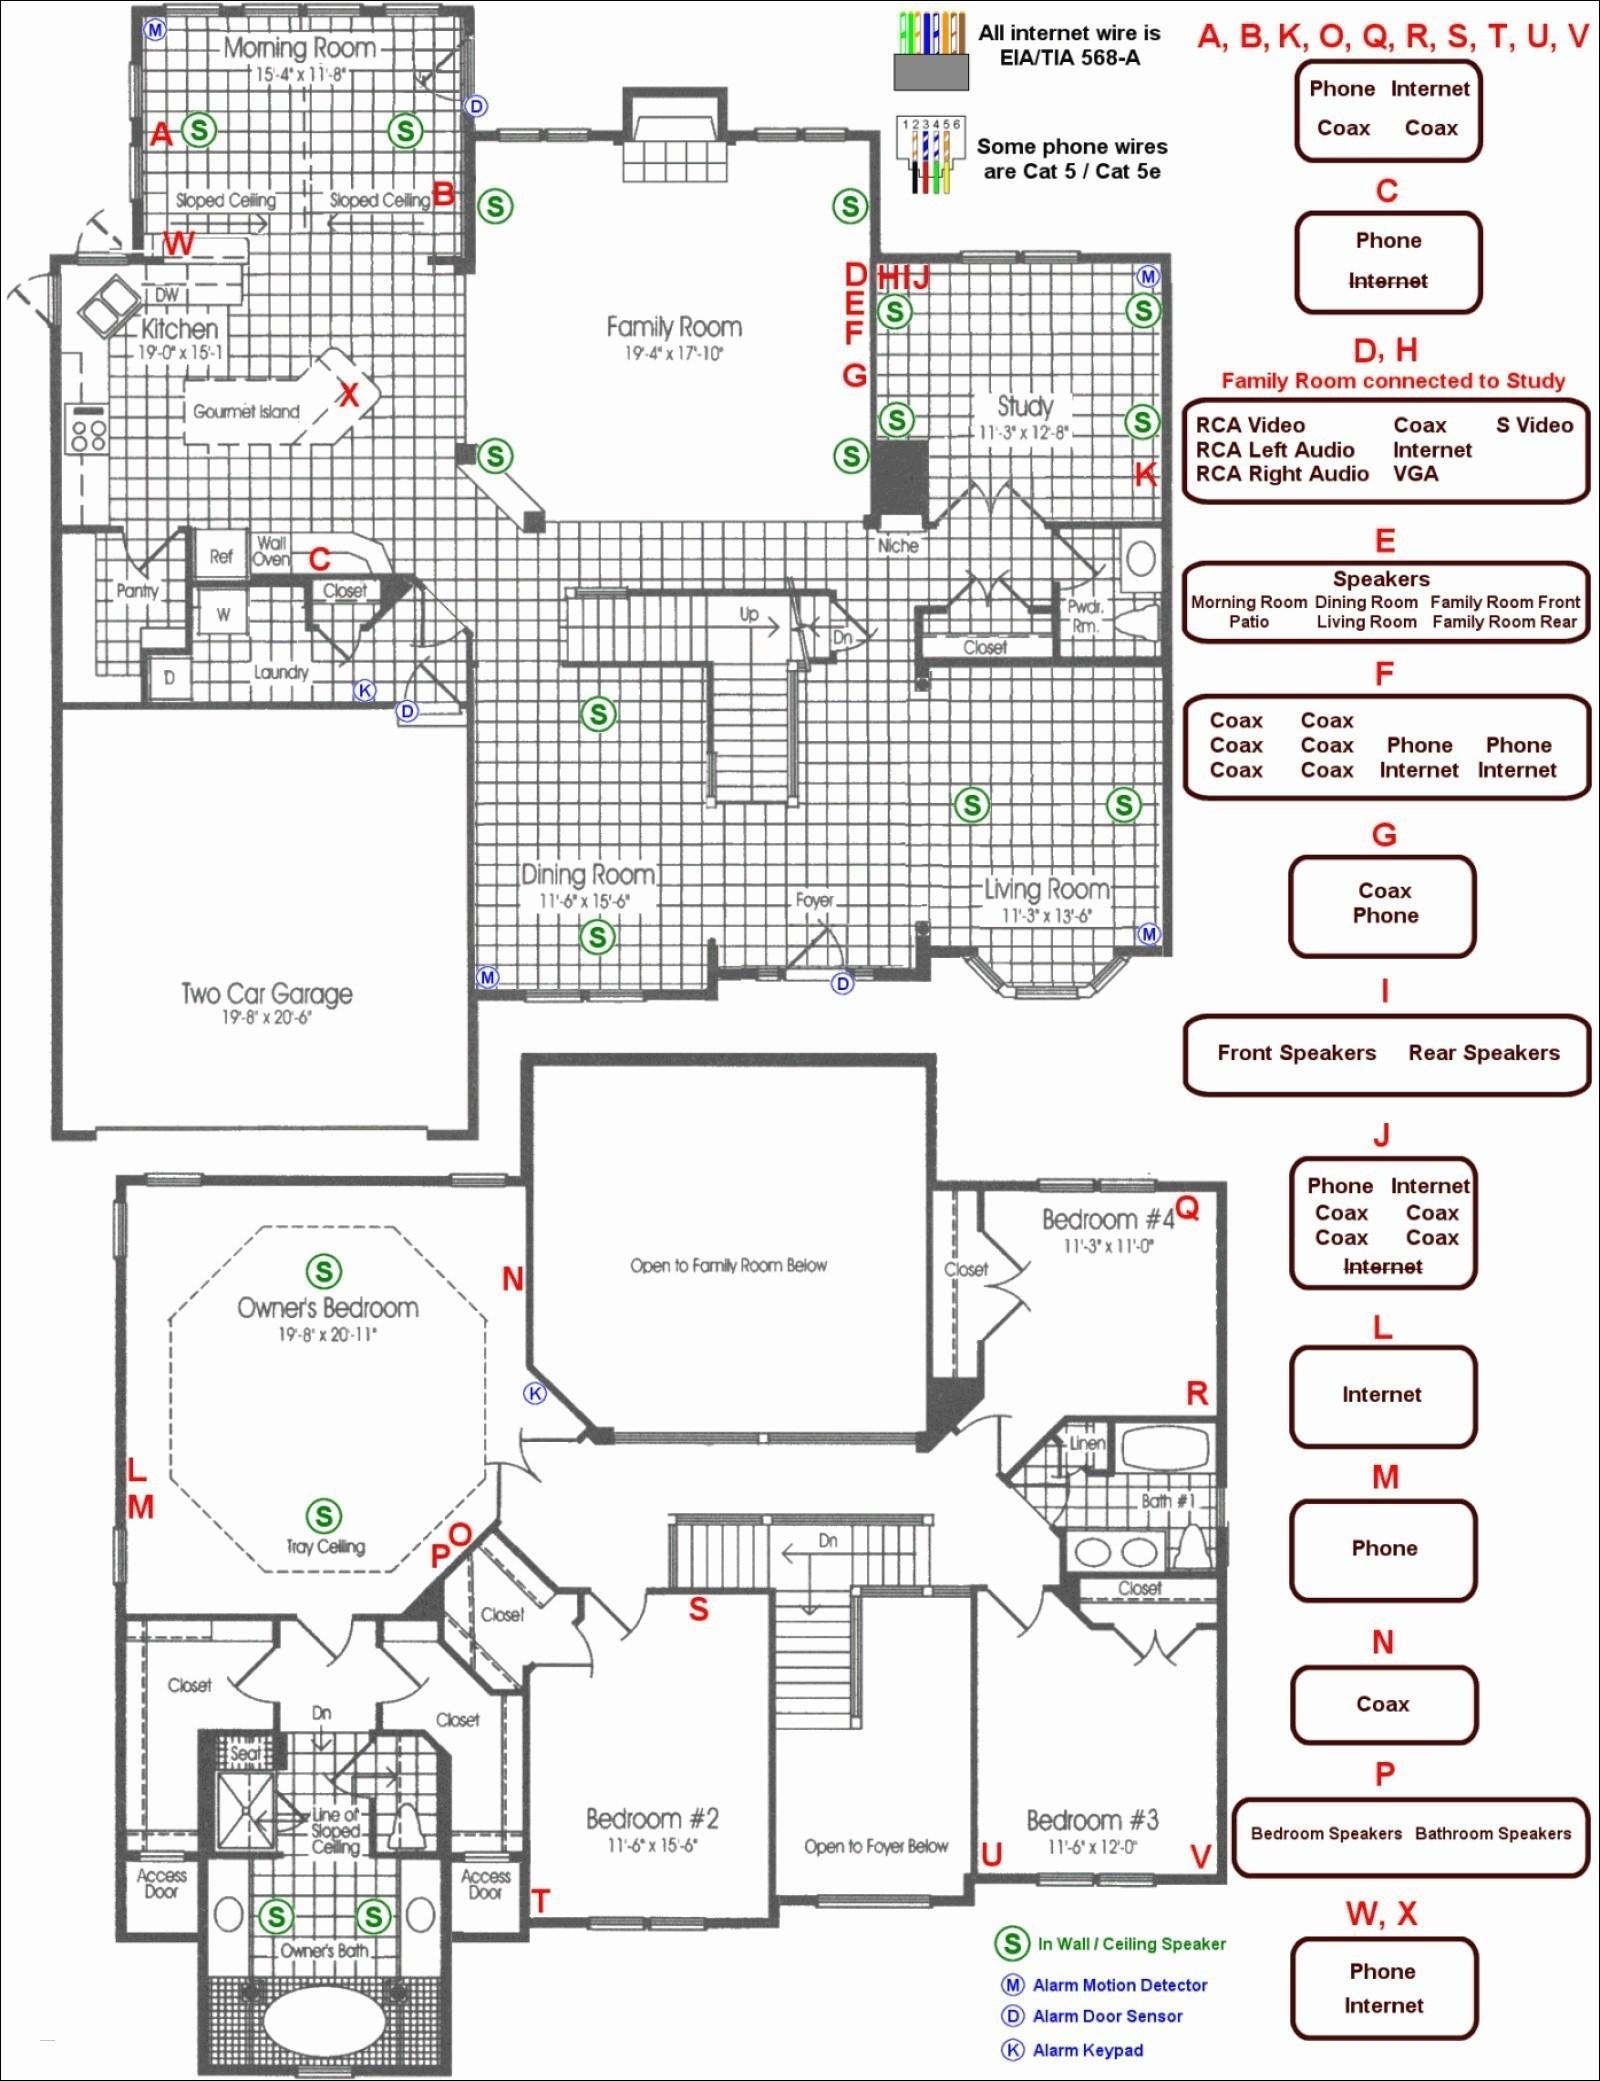 YD_1046] Wiring Diagram Of A BuildingHyedi Egre Drosi Alia Kapemie Isop Apan Pneu Tzici Rect Mohammedshrine  Librar Wiring 101